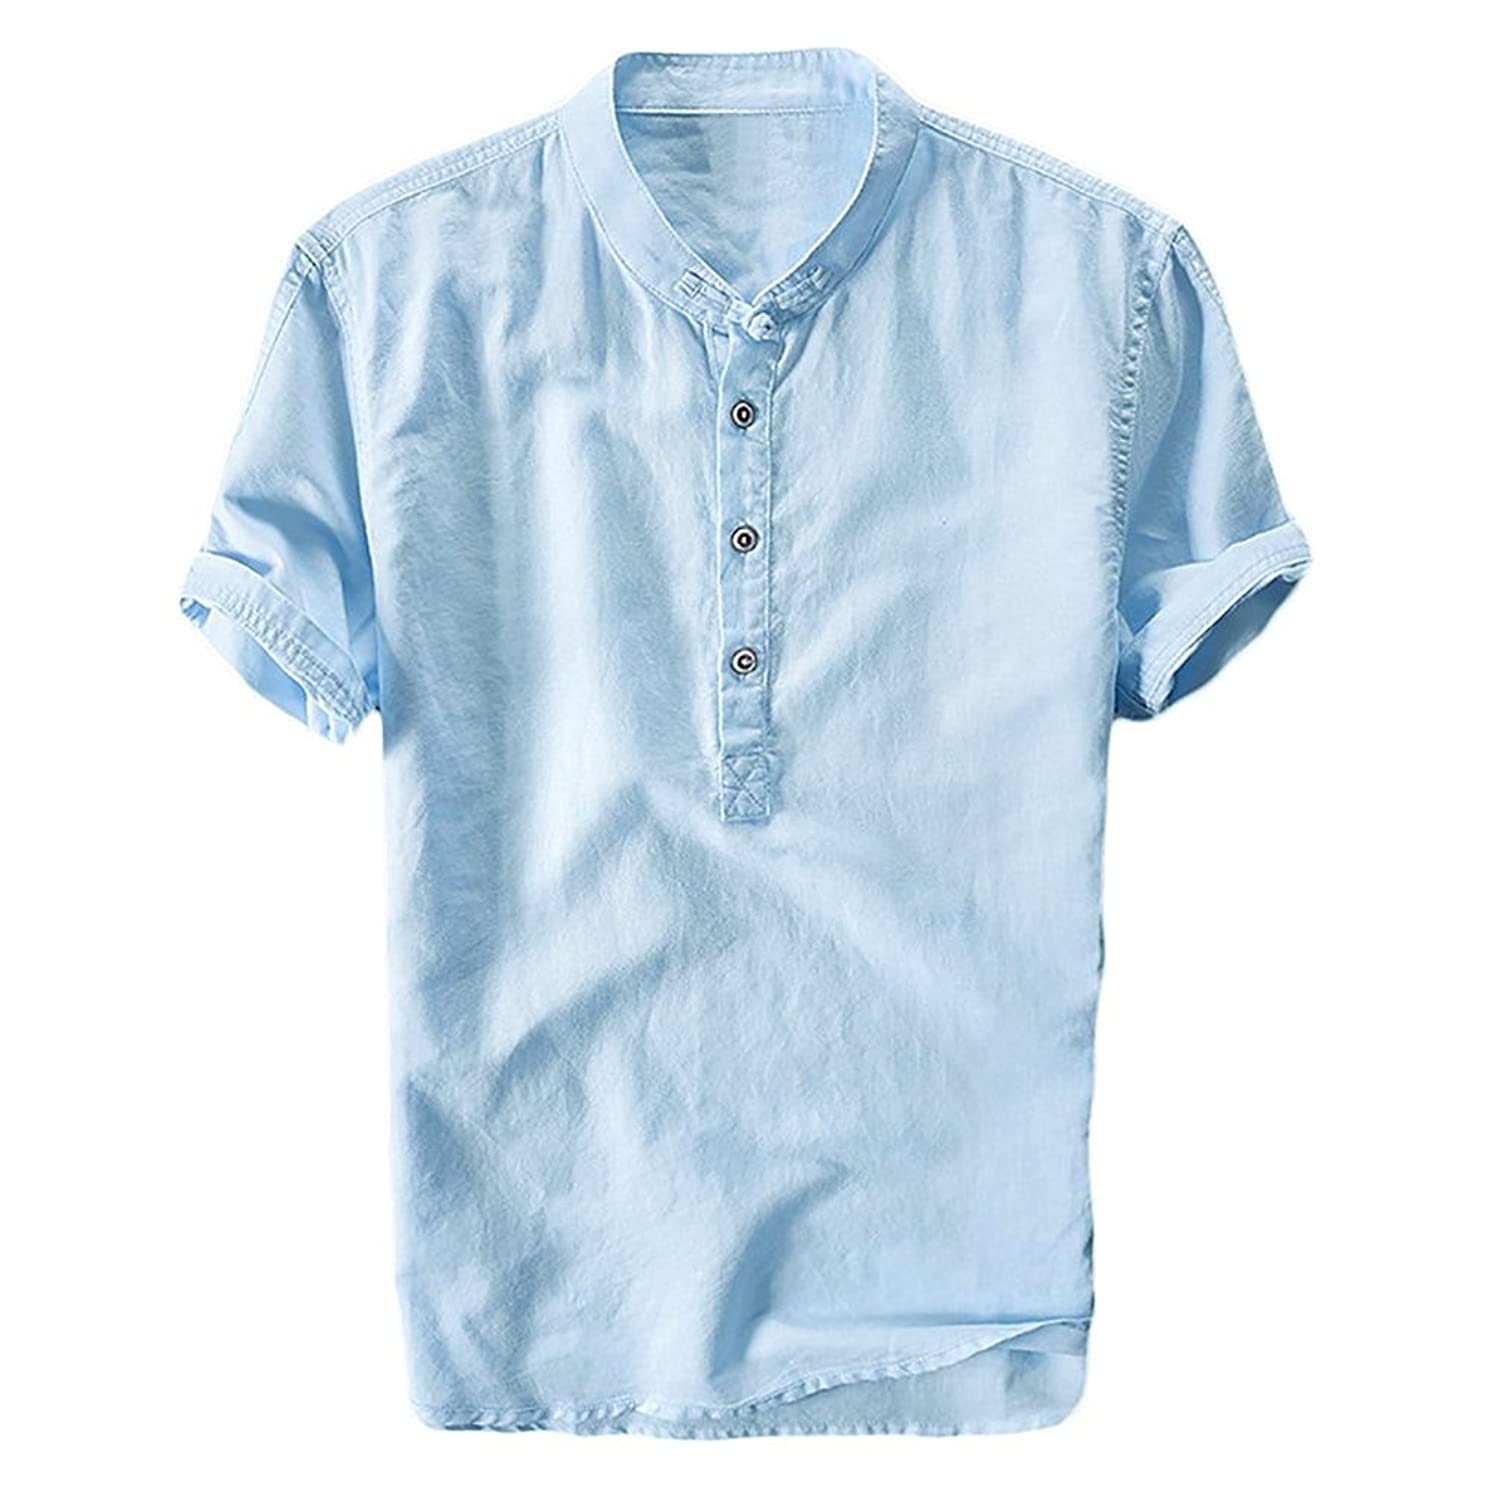 Mens Linen Henley Shirt Casual Short Sleeve T Shirt Pullovers Tees Retro Frog Button Cotton Shirts Beach Tops